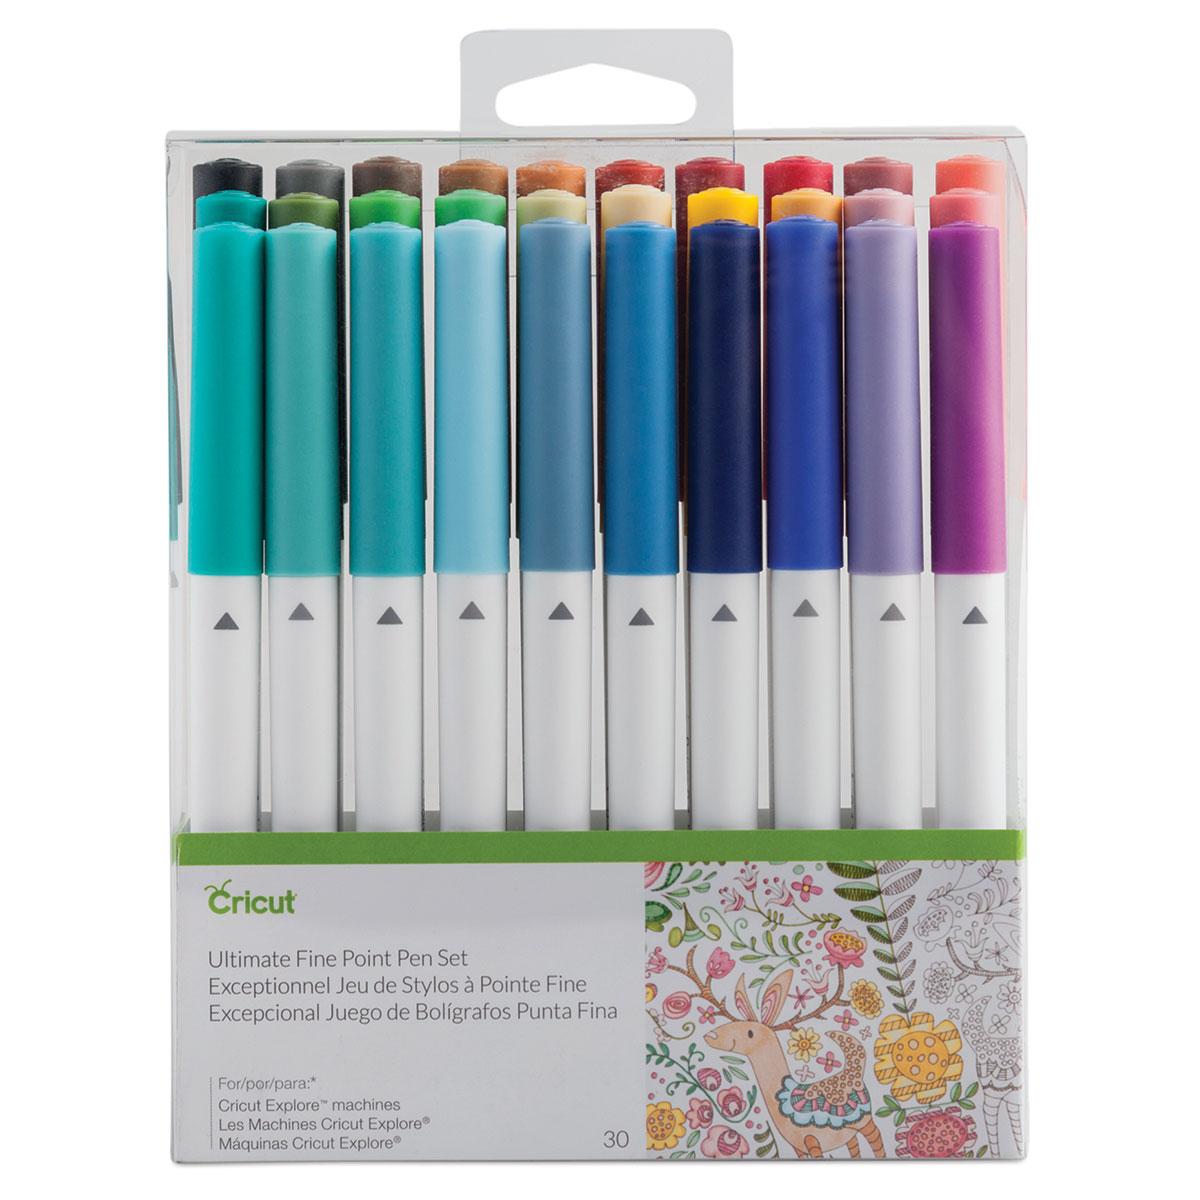 Cricut Pen Set - Ultimate Set of 30